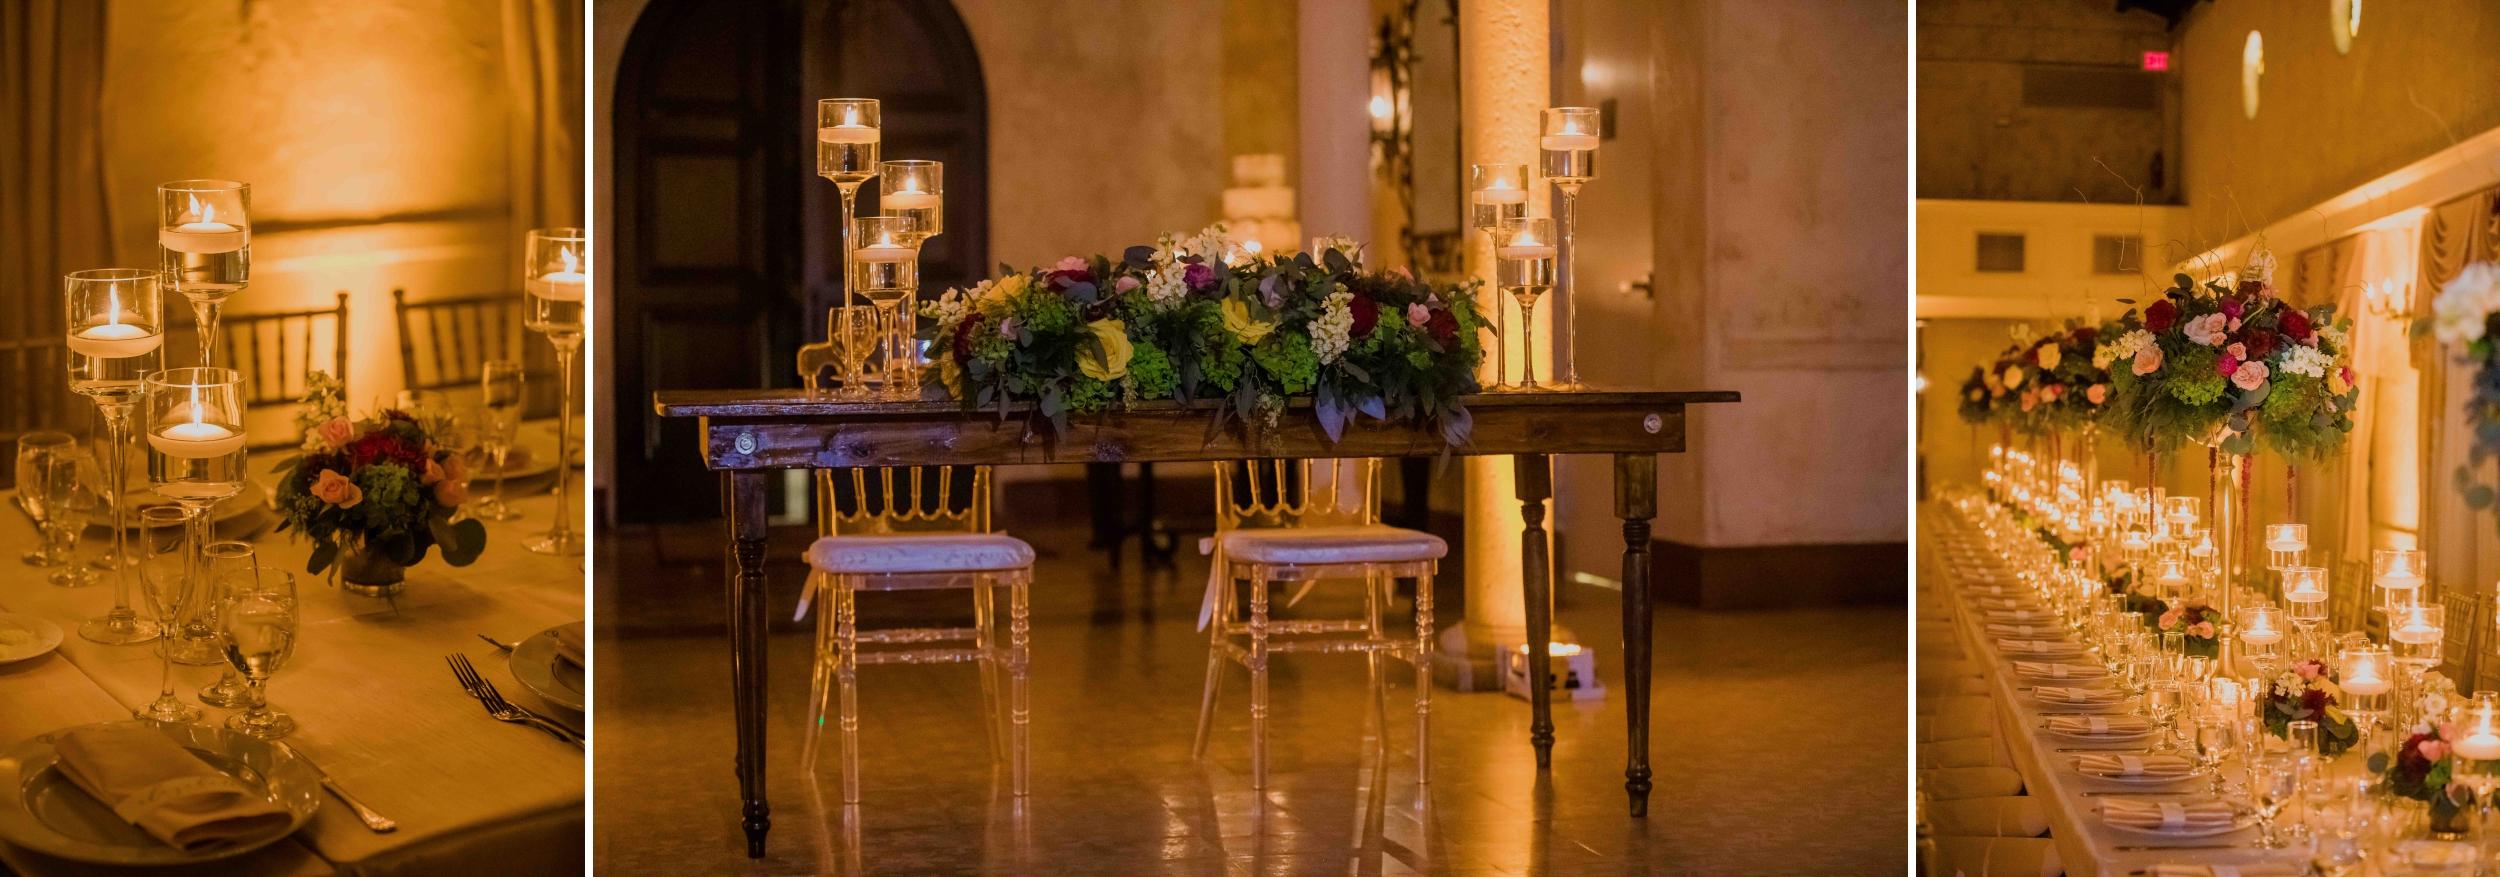 Wedding - Coco Plum - Coral Gables Congregational - Santy Martinez Photography 26.jpg